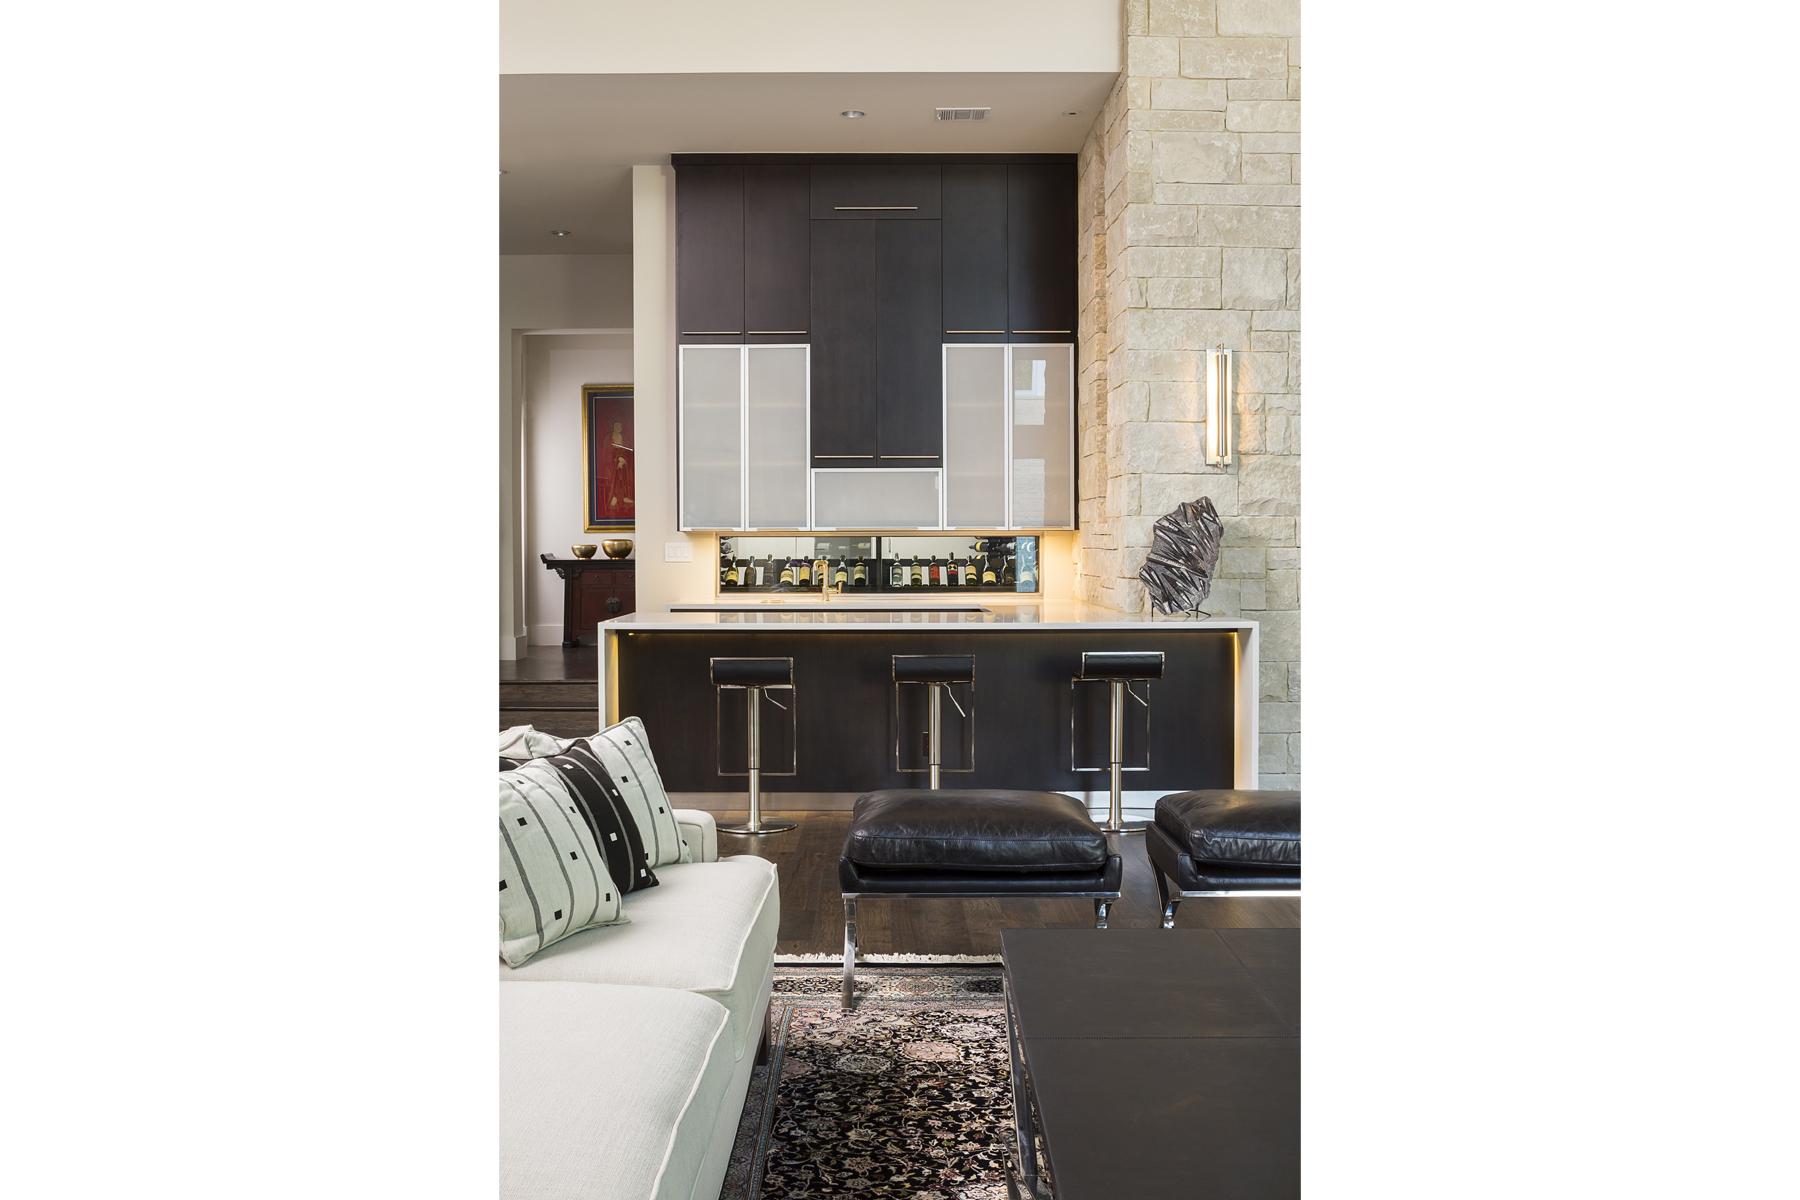 StratfordResidence-22-living-kitchen